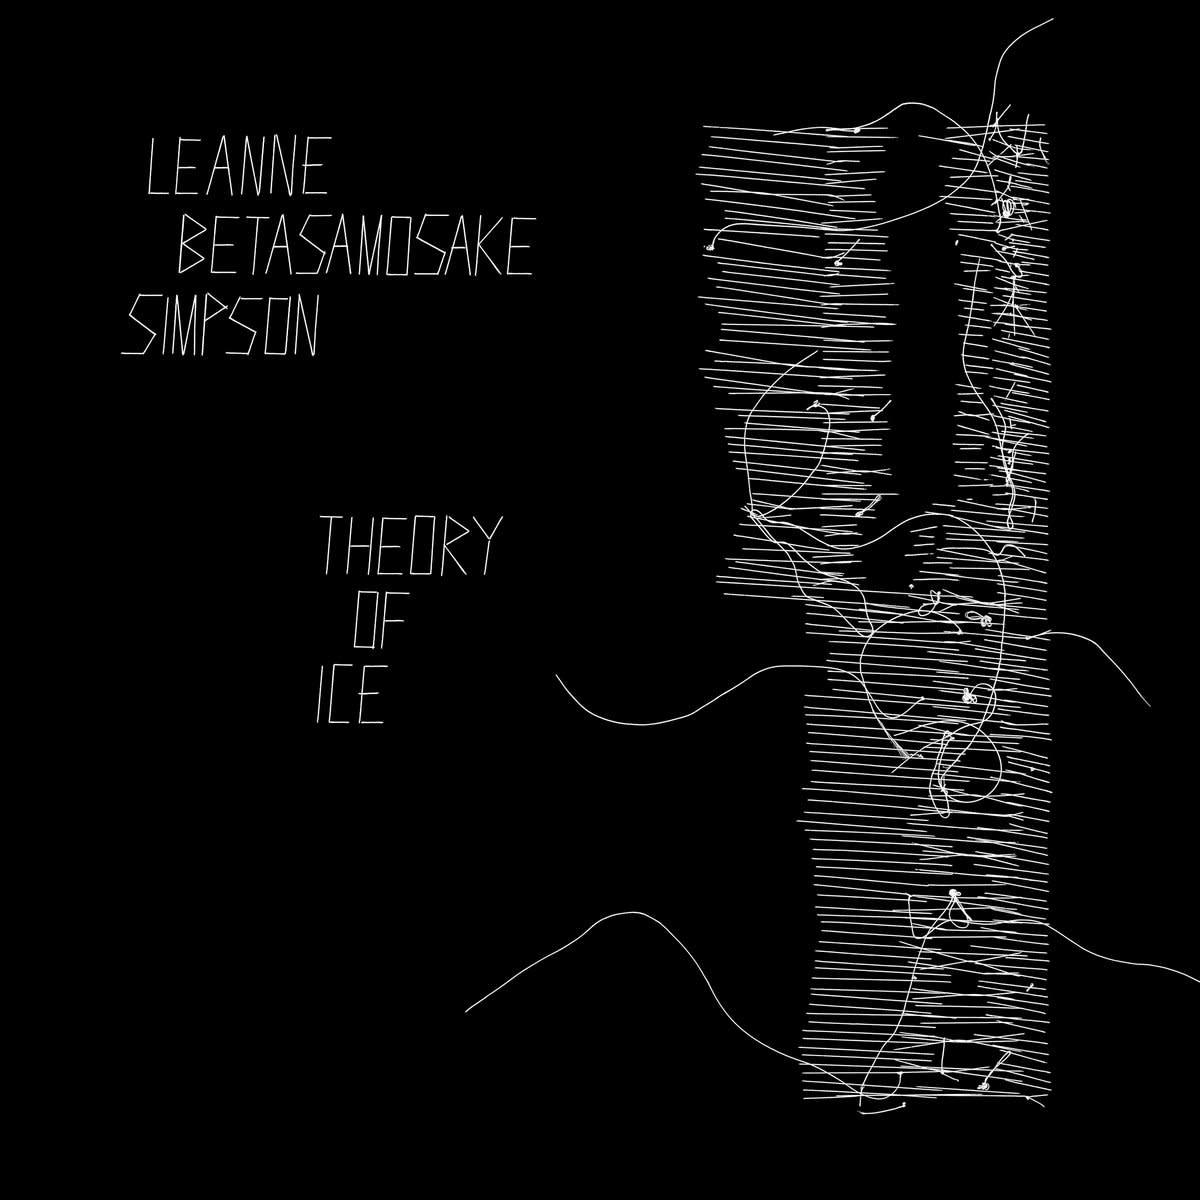 Indigenous - Turtle Island Leanne Betasamosake Simpson - Theory Of Ice